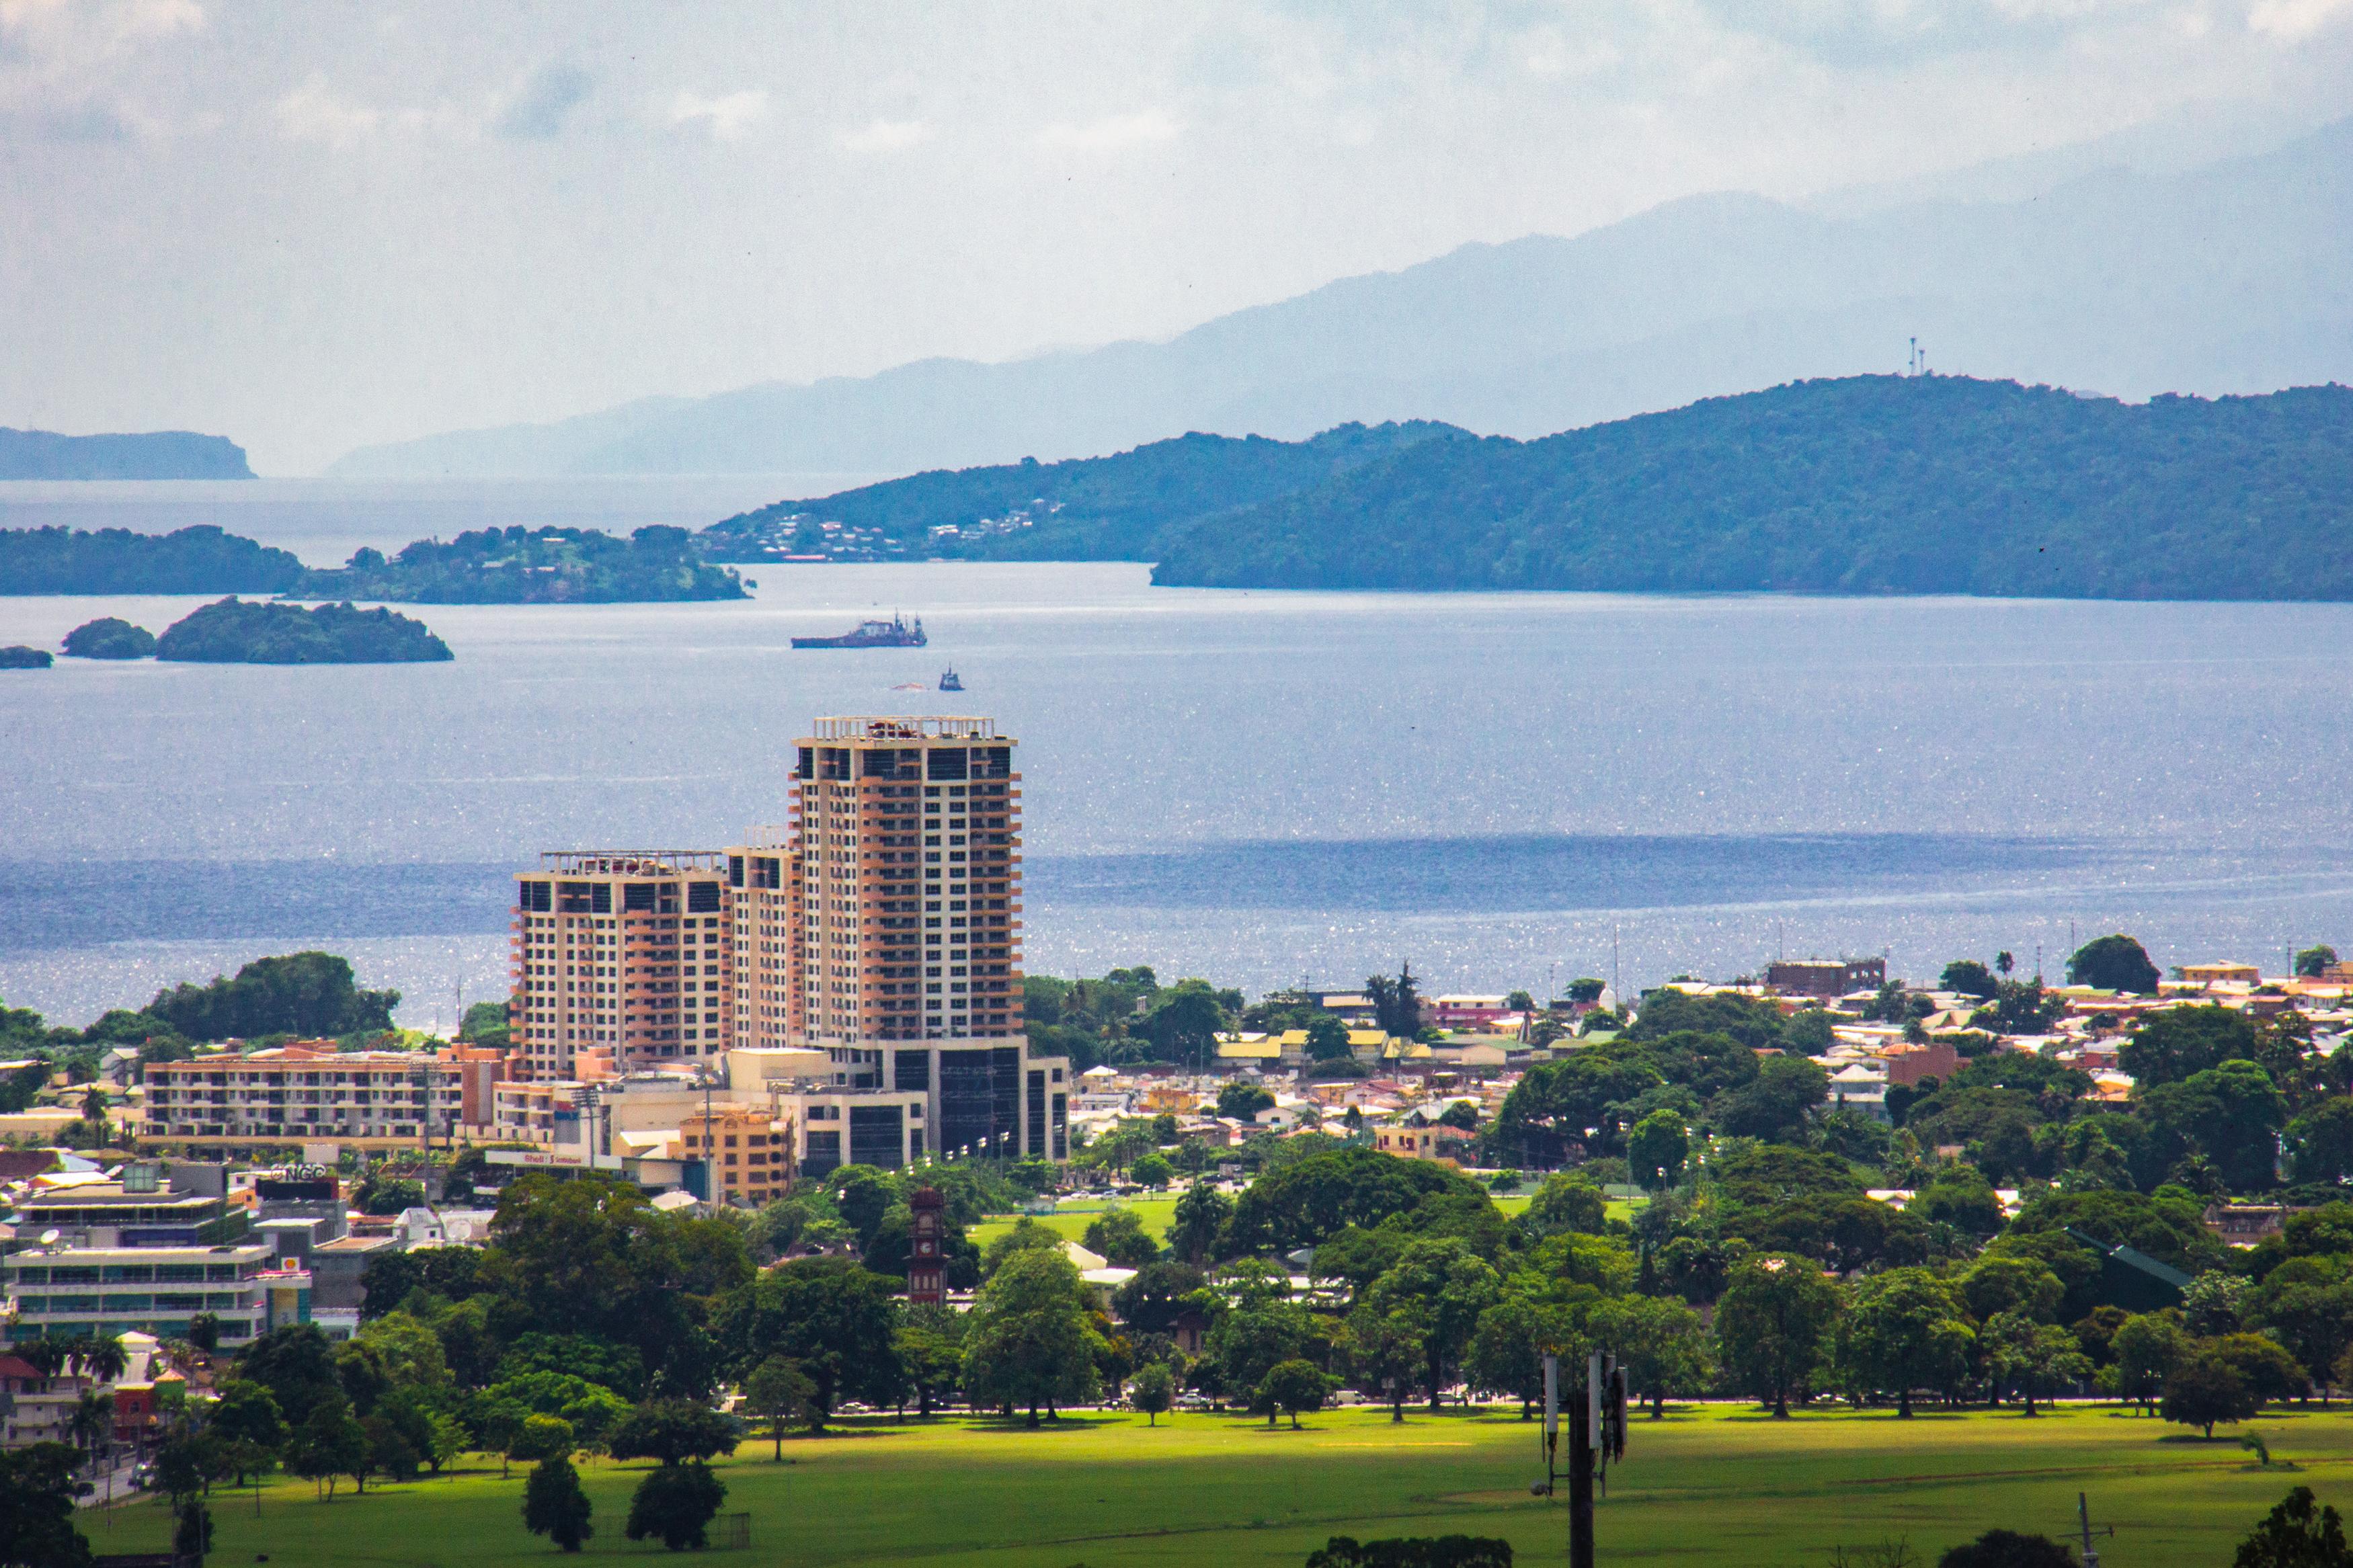 Trinidad & Tobago Film Company Ltd. (FilmTT)